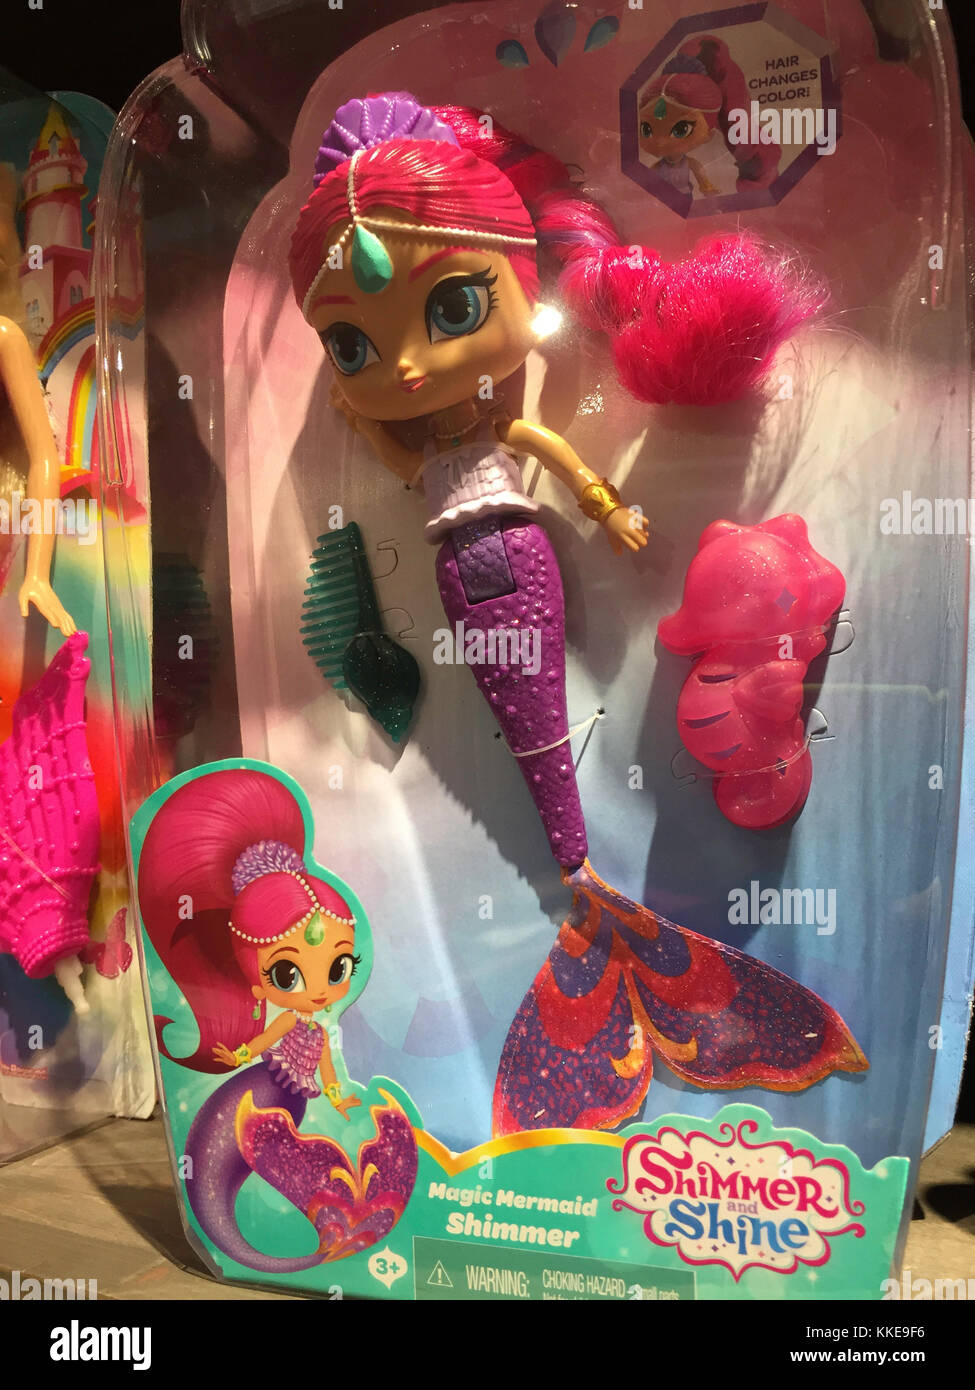 Shimmer and Shine Mermaid Doll, USA - Stock Image